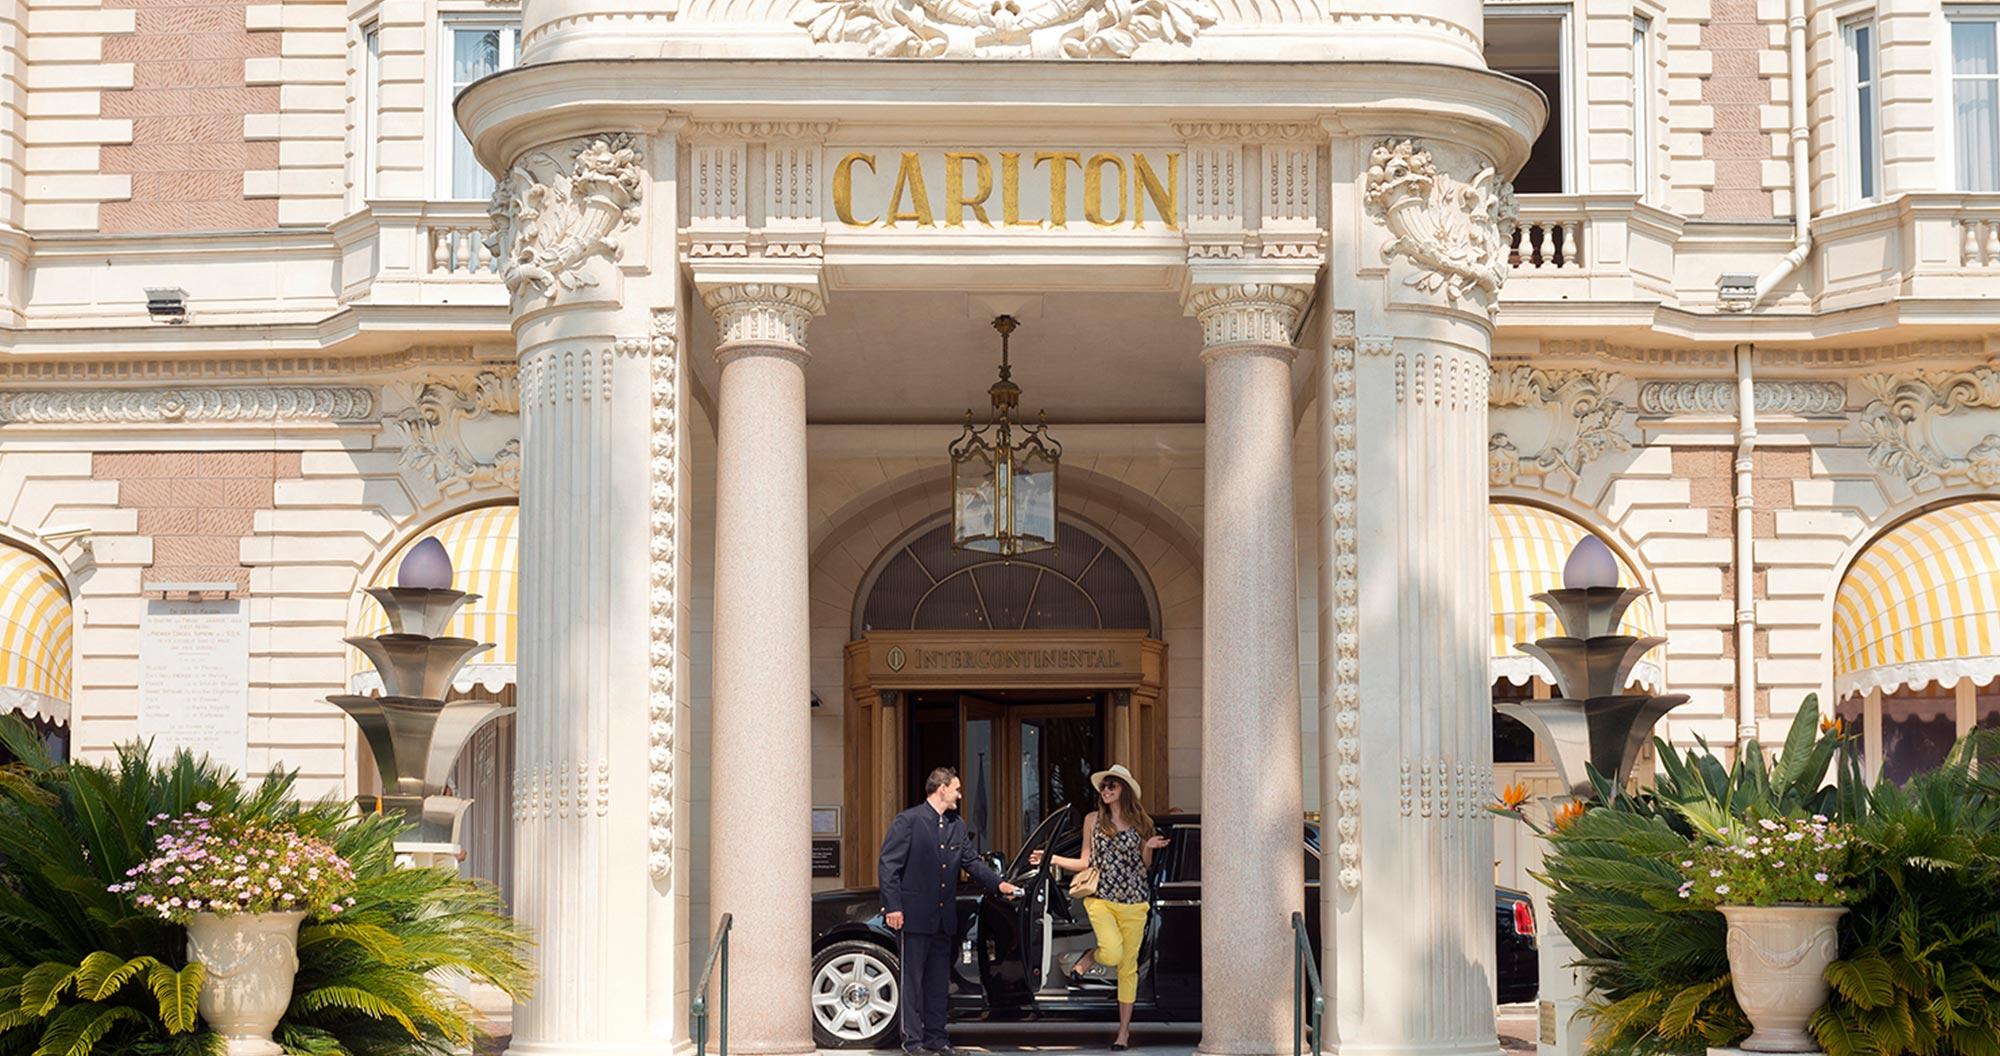 InterContinental Carlton